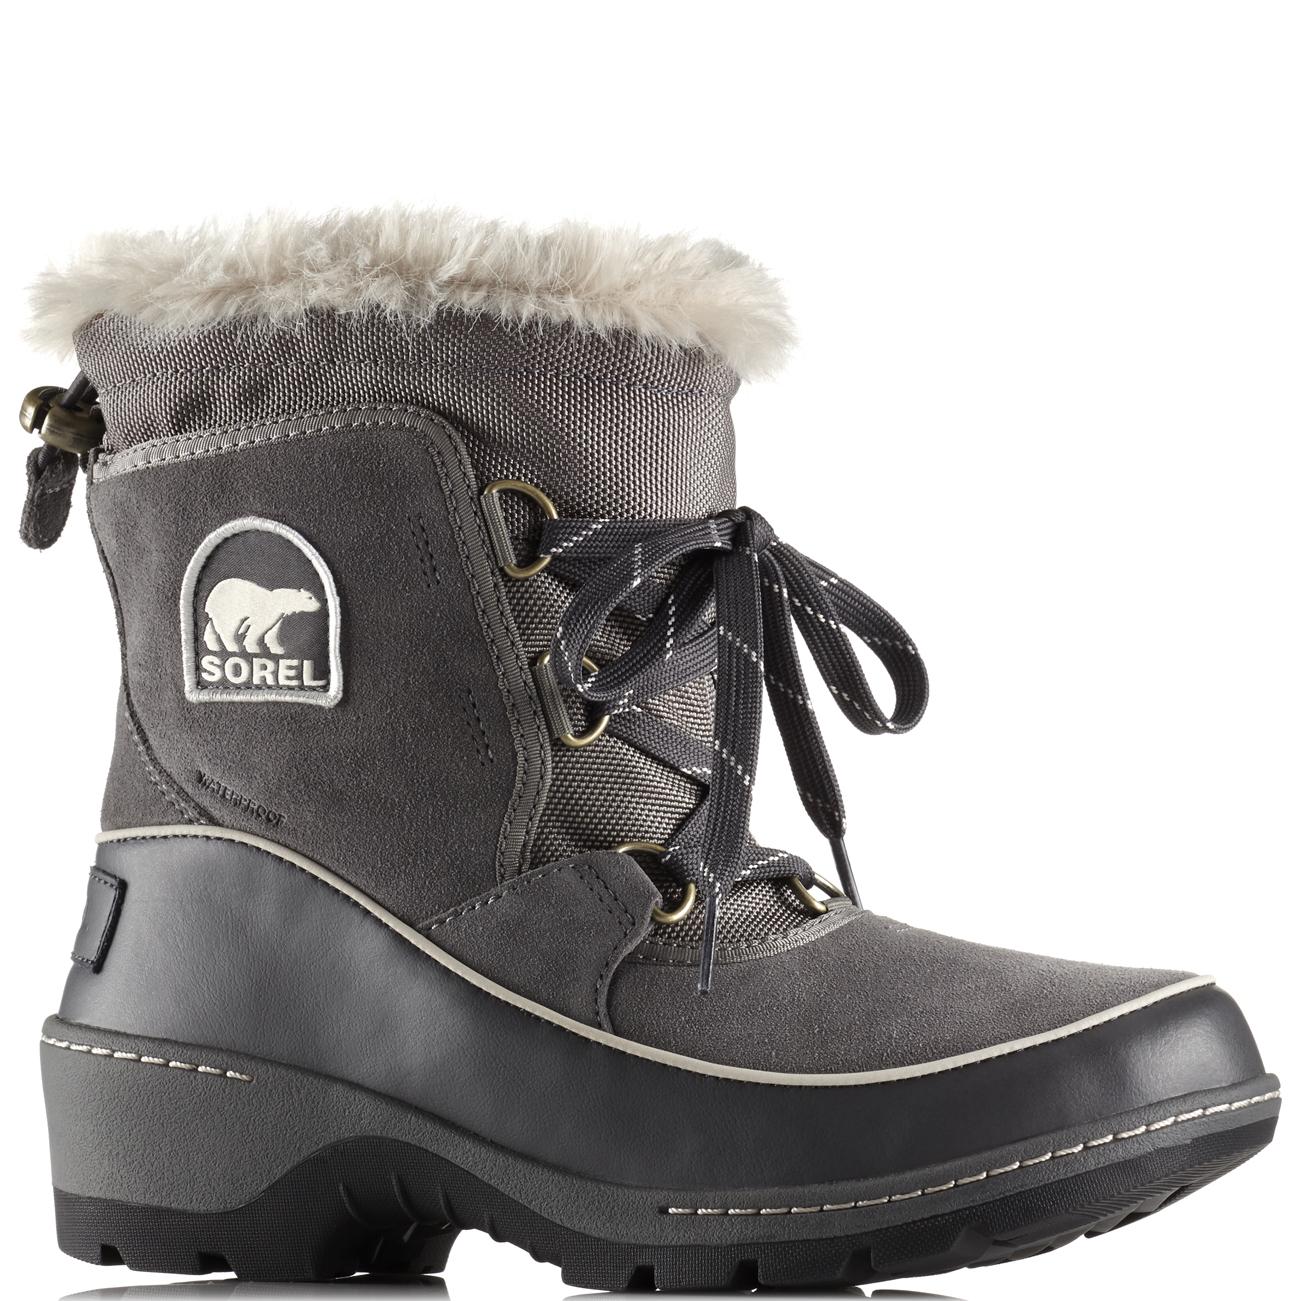 Nieve Impermeable Invierno para Mujer Lluvia Sorel Torino Lluvia Mujer Senderismo Caminar botín Reino Unido 3-9 291a0a